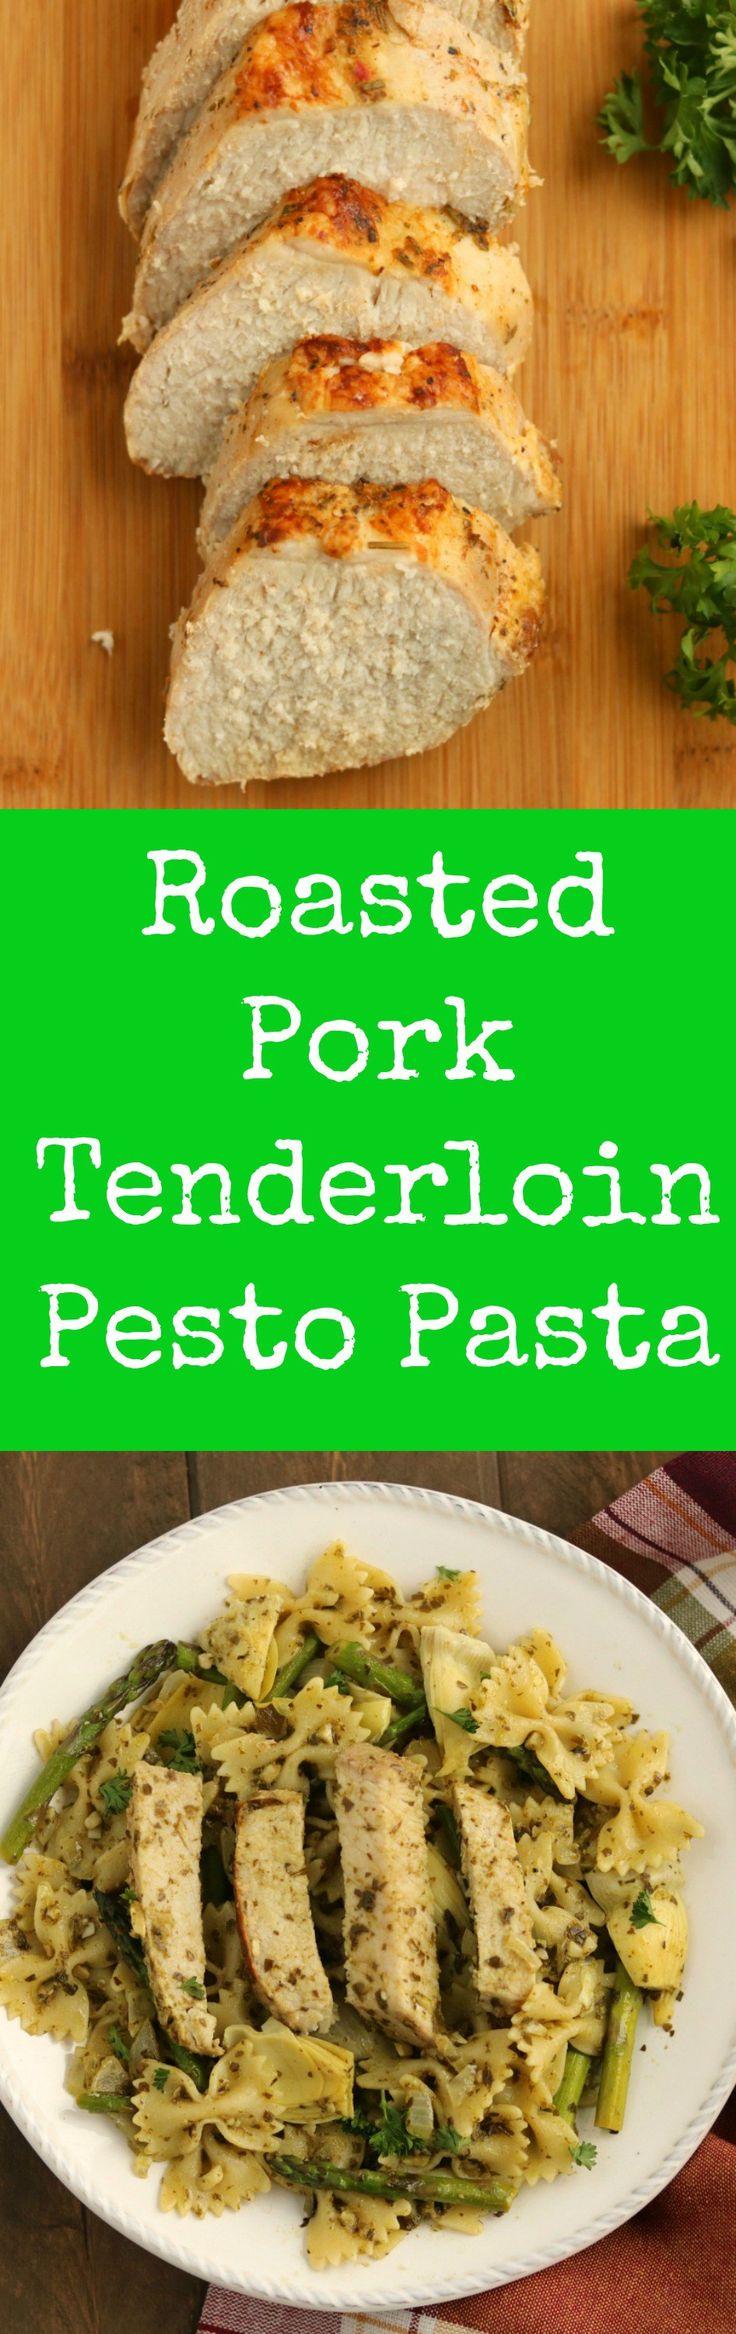 pork tenderloin pesto pasta #realflavorrealfast #ad